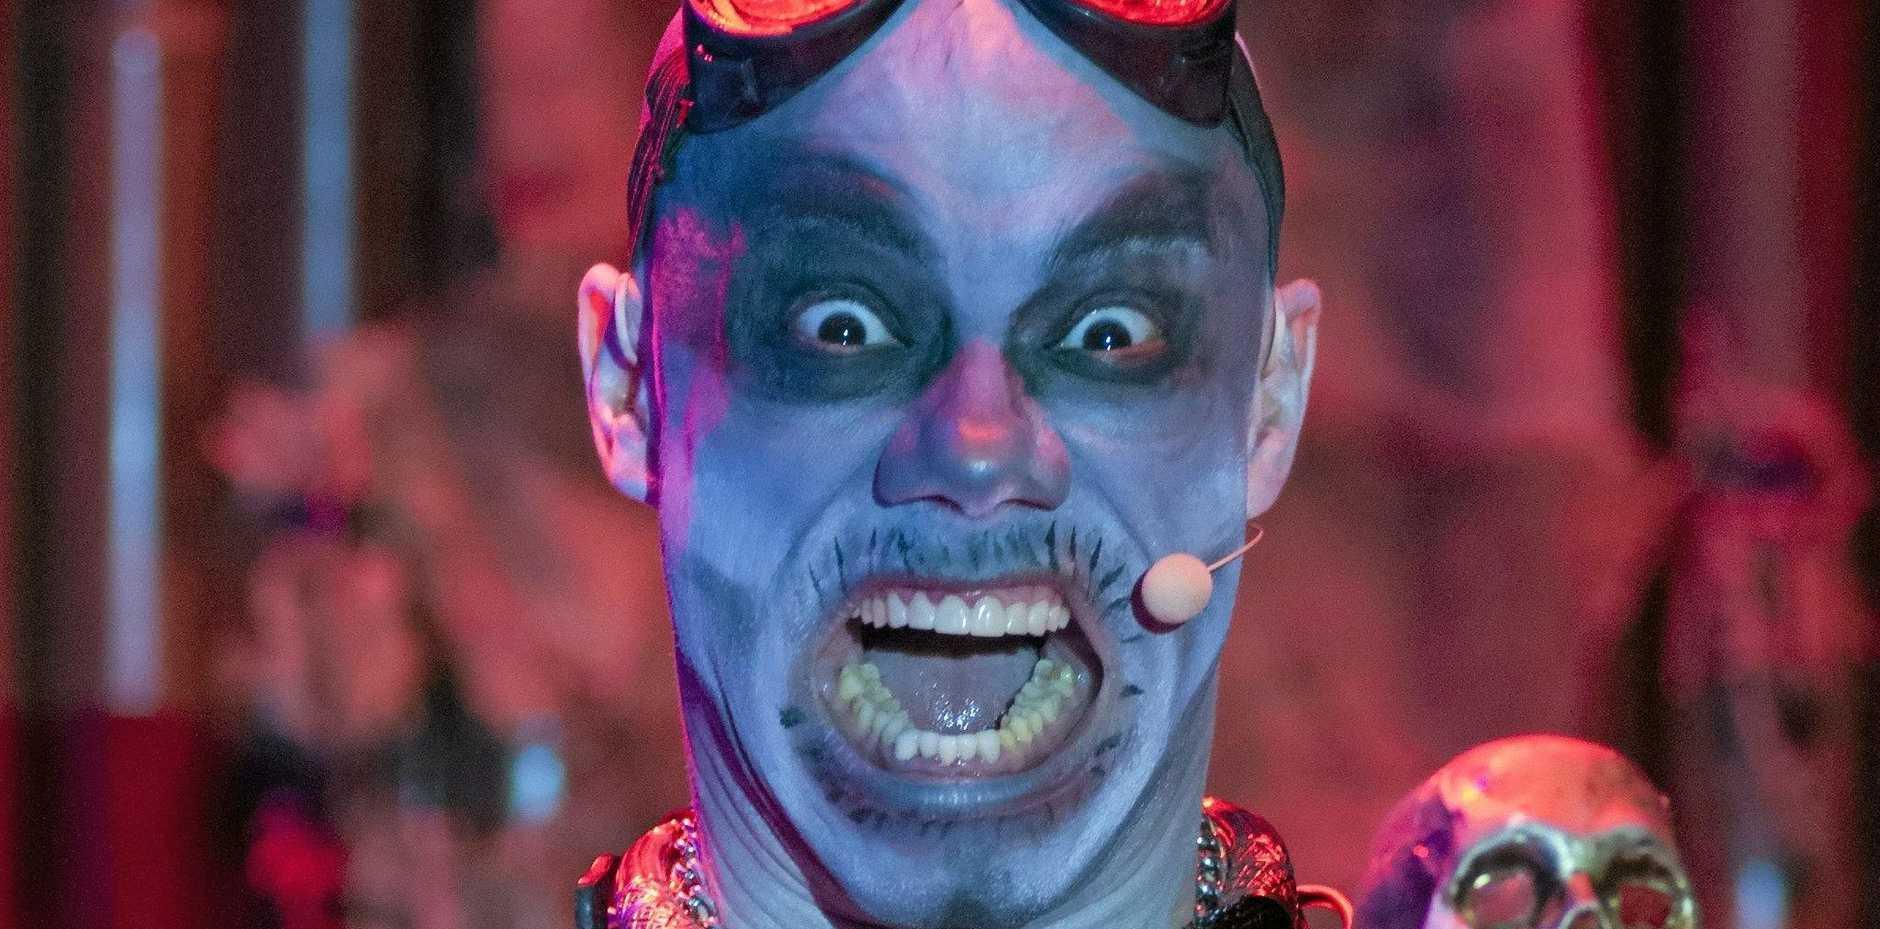 MAD MUSIC MAN: James Berkley Harrison III in character as Doctor Moron.